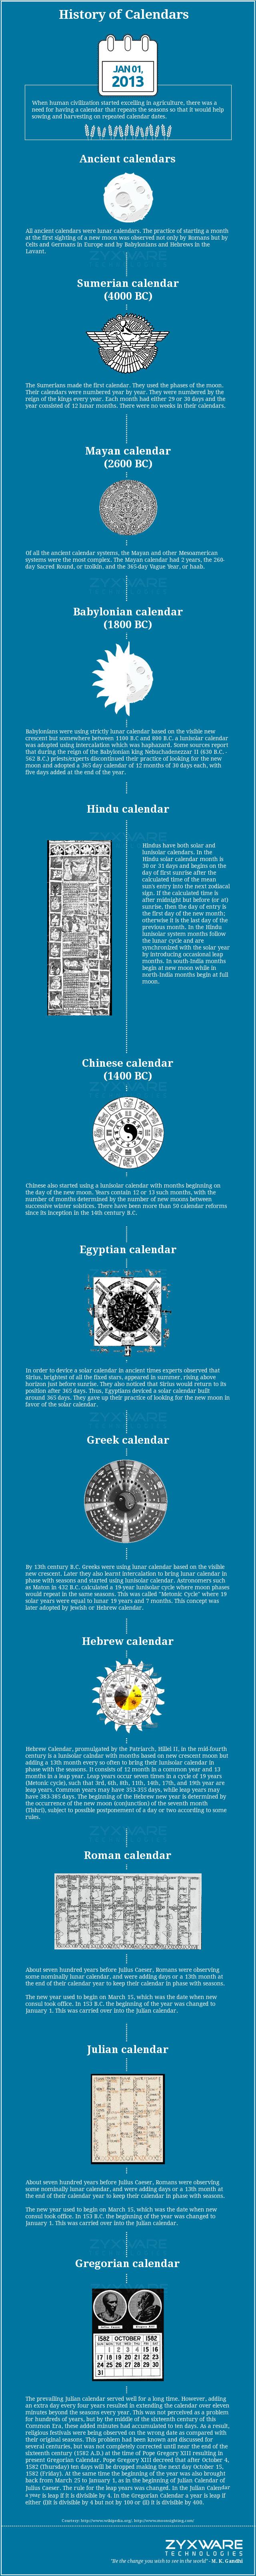 History of Calendars